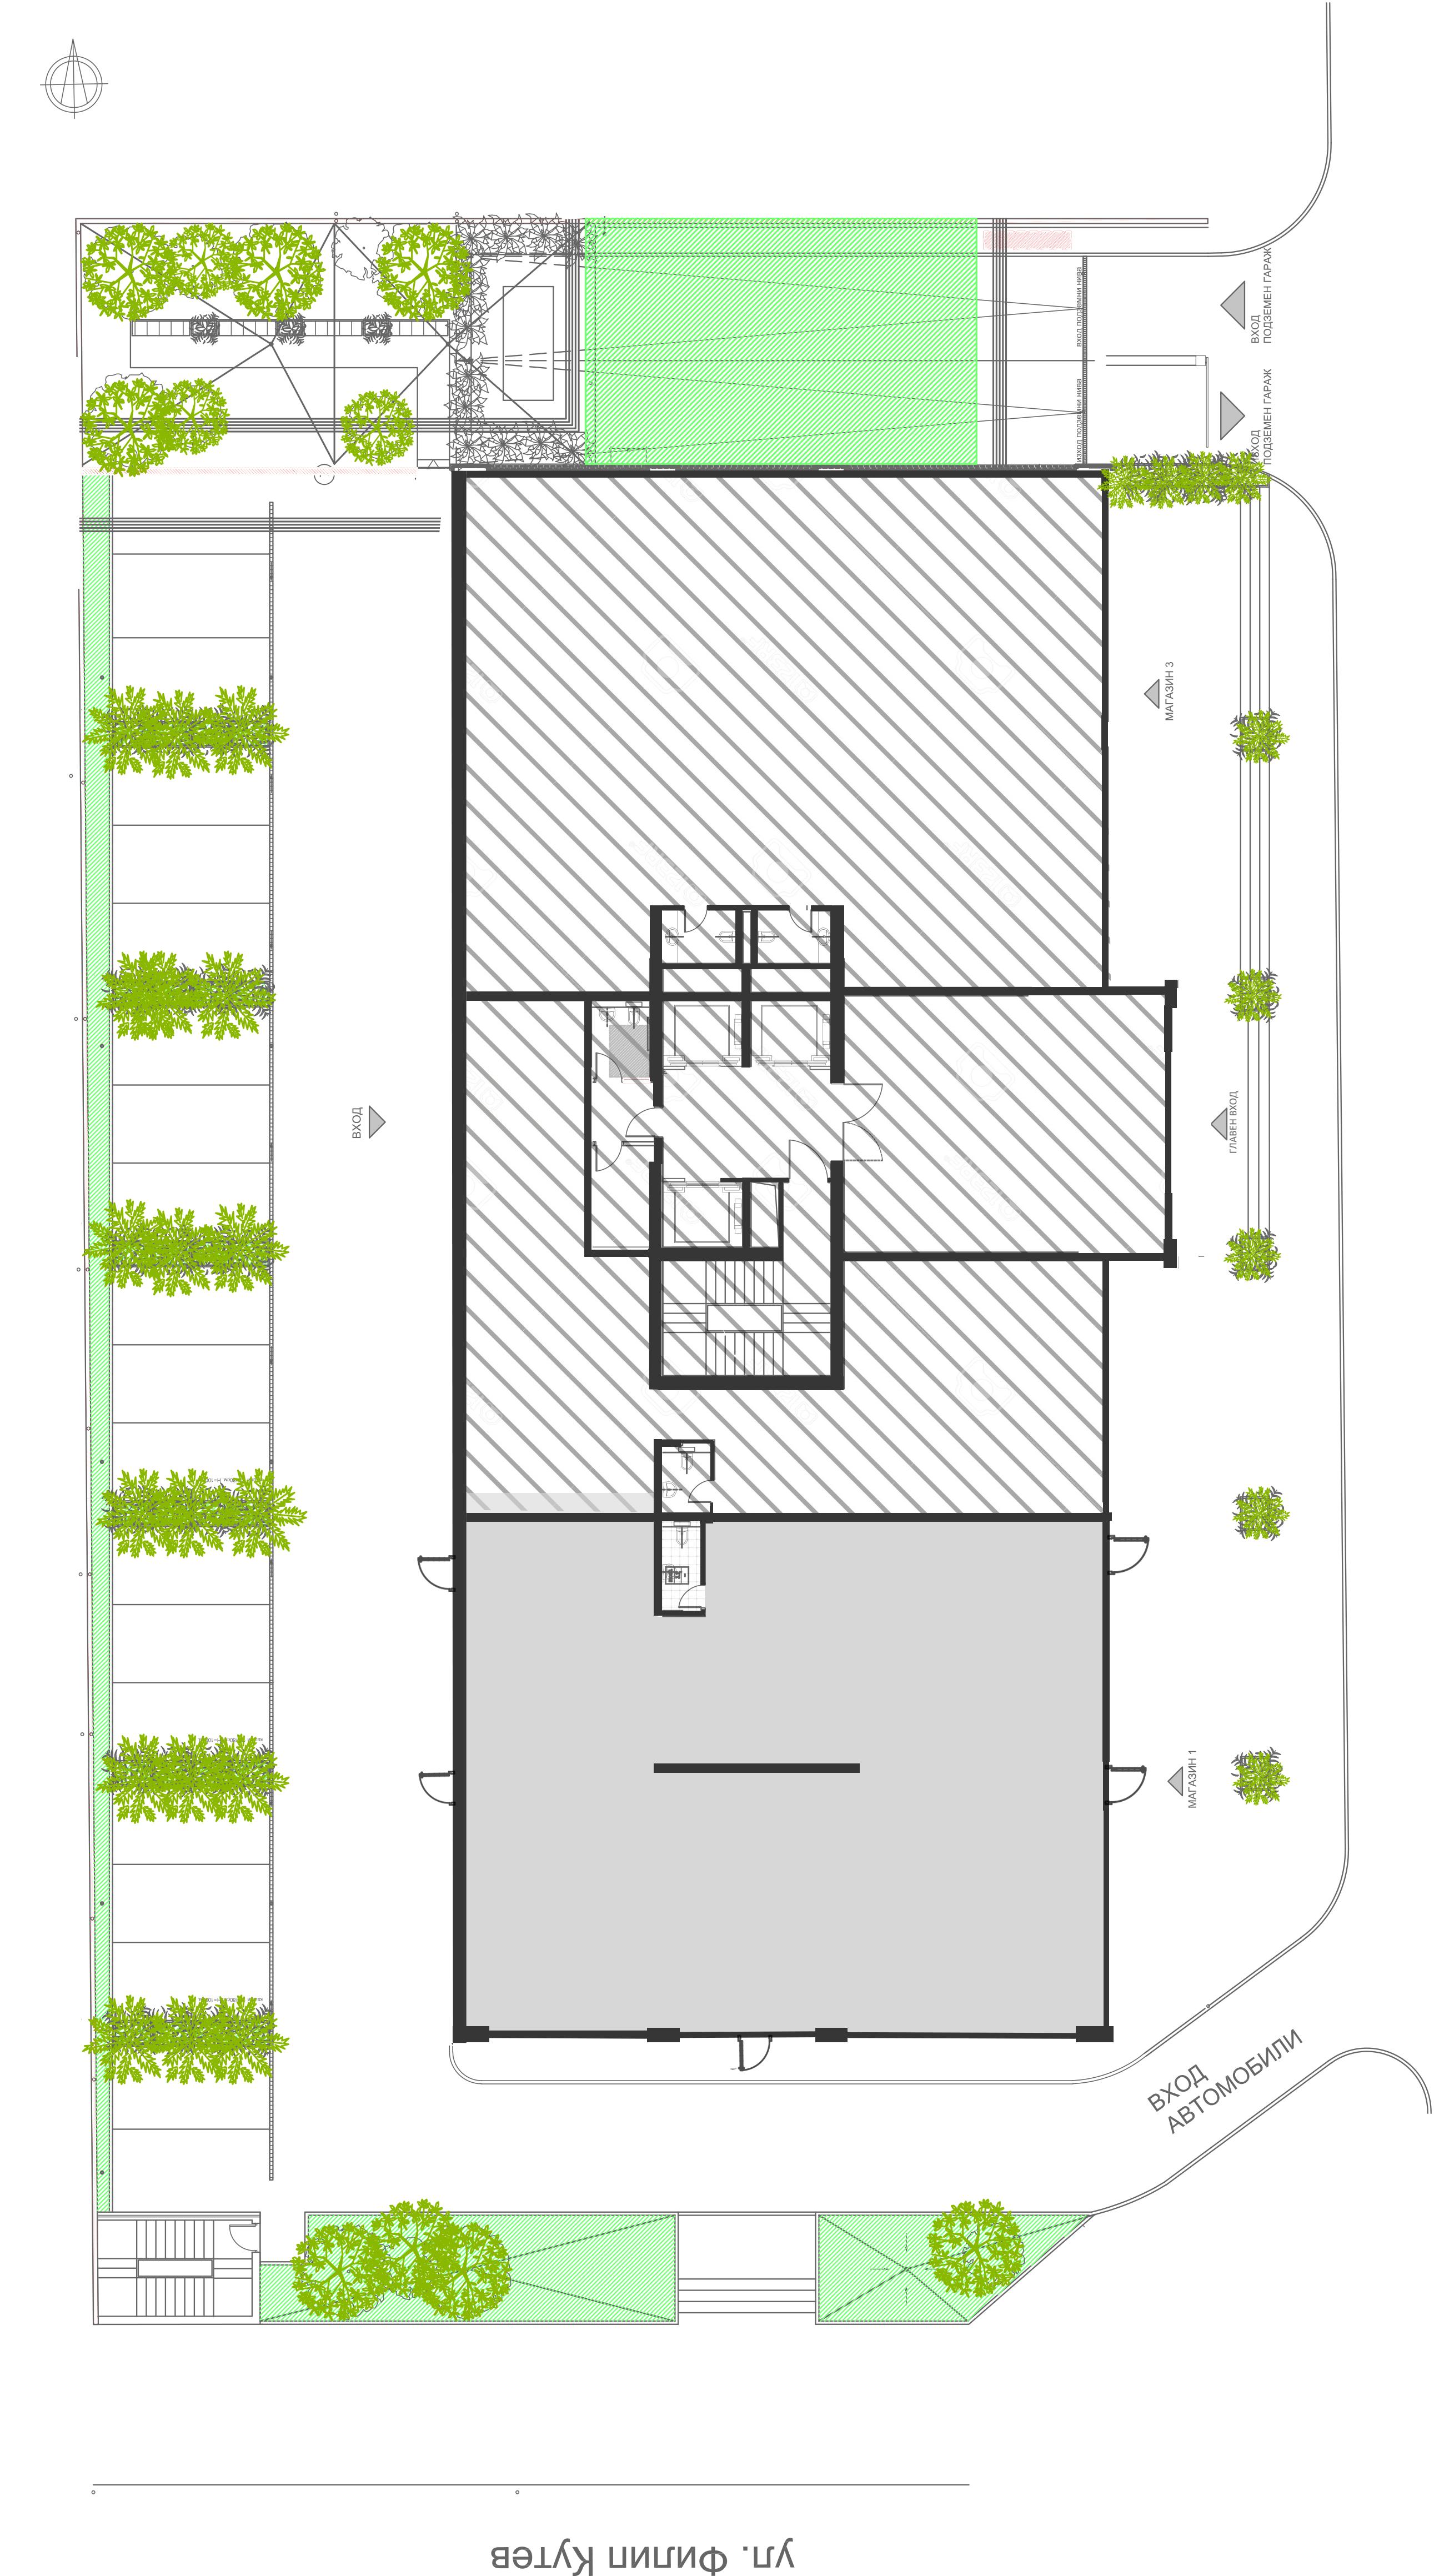 NAEMI_MAGAZINI_CHERTEJ_EN_BUILDING_405